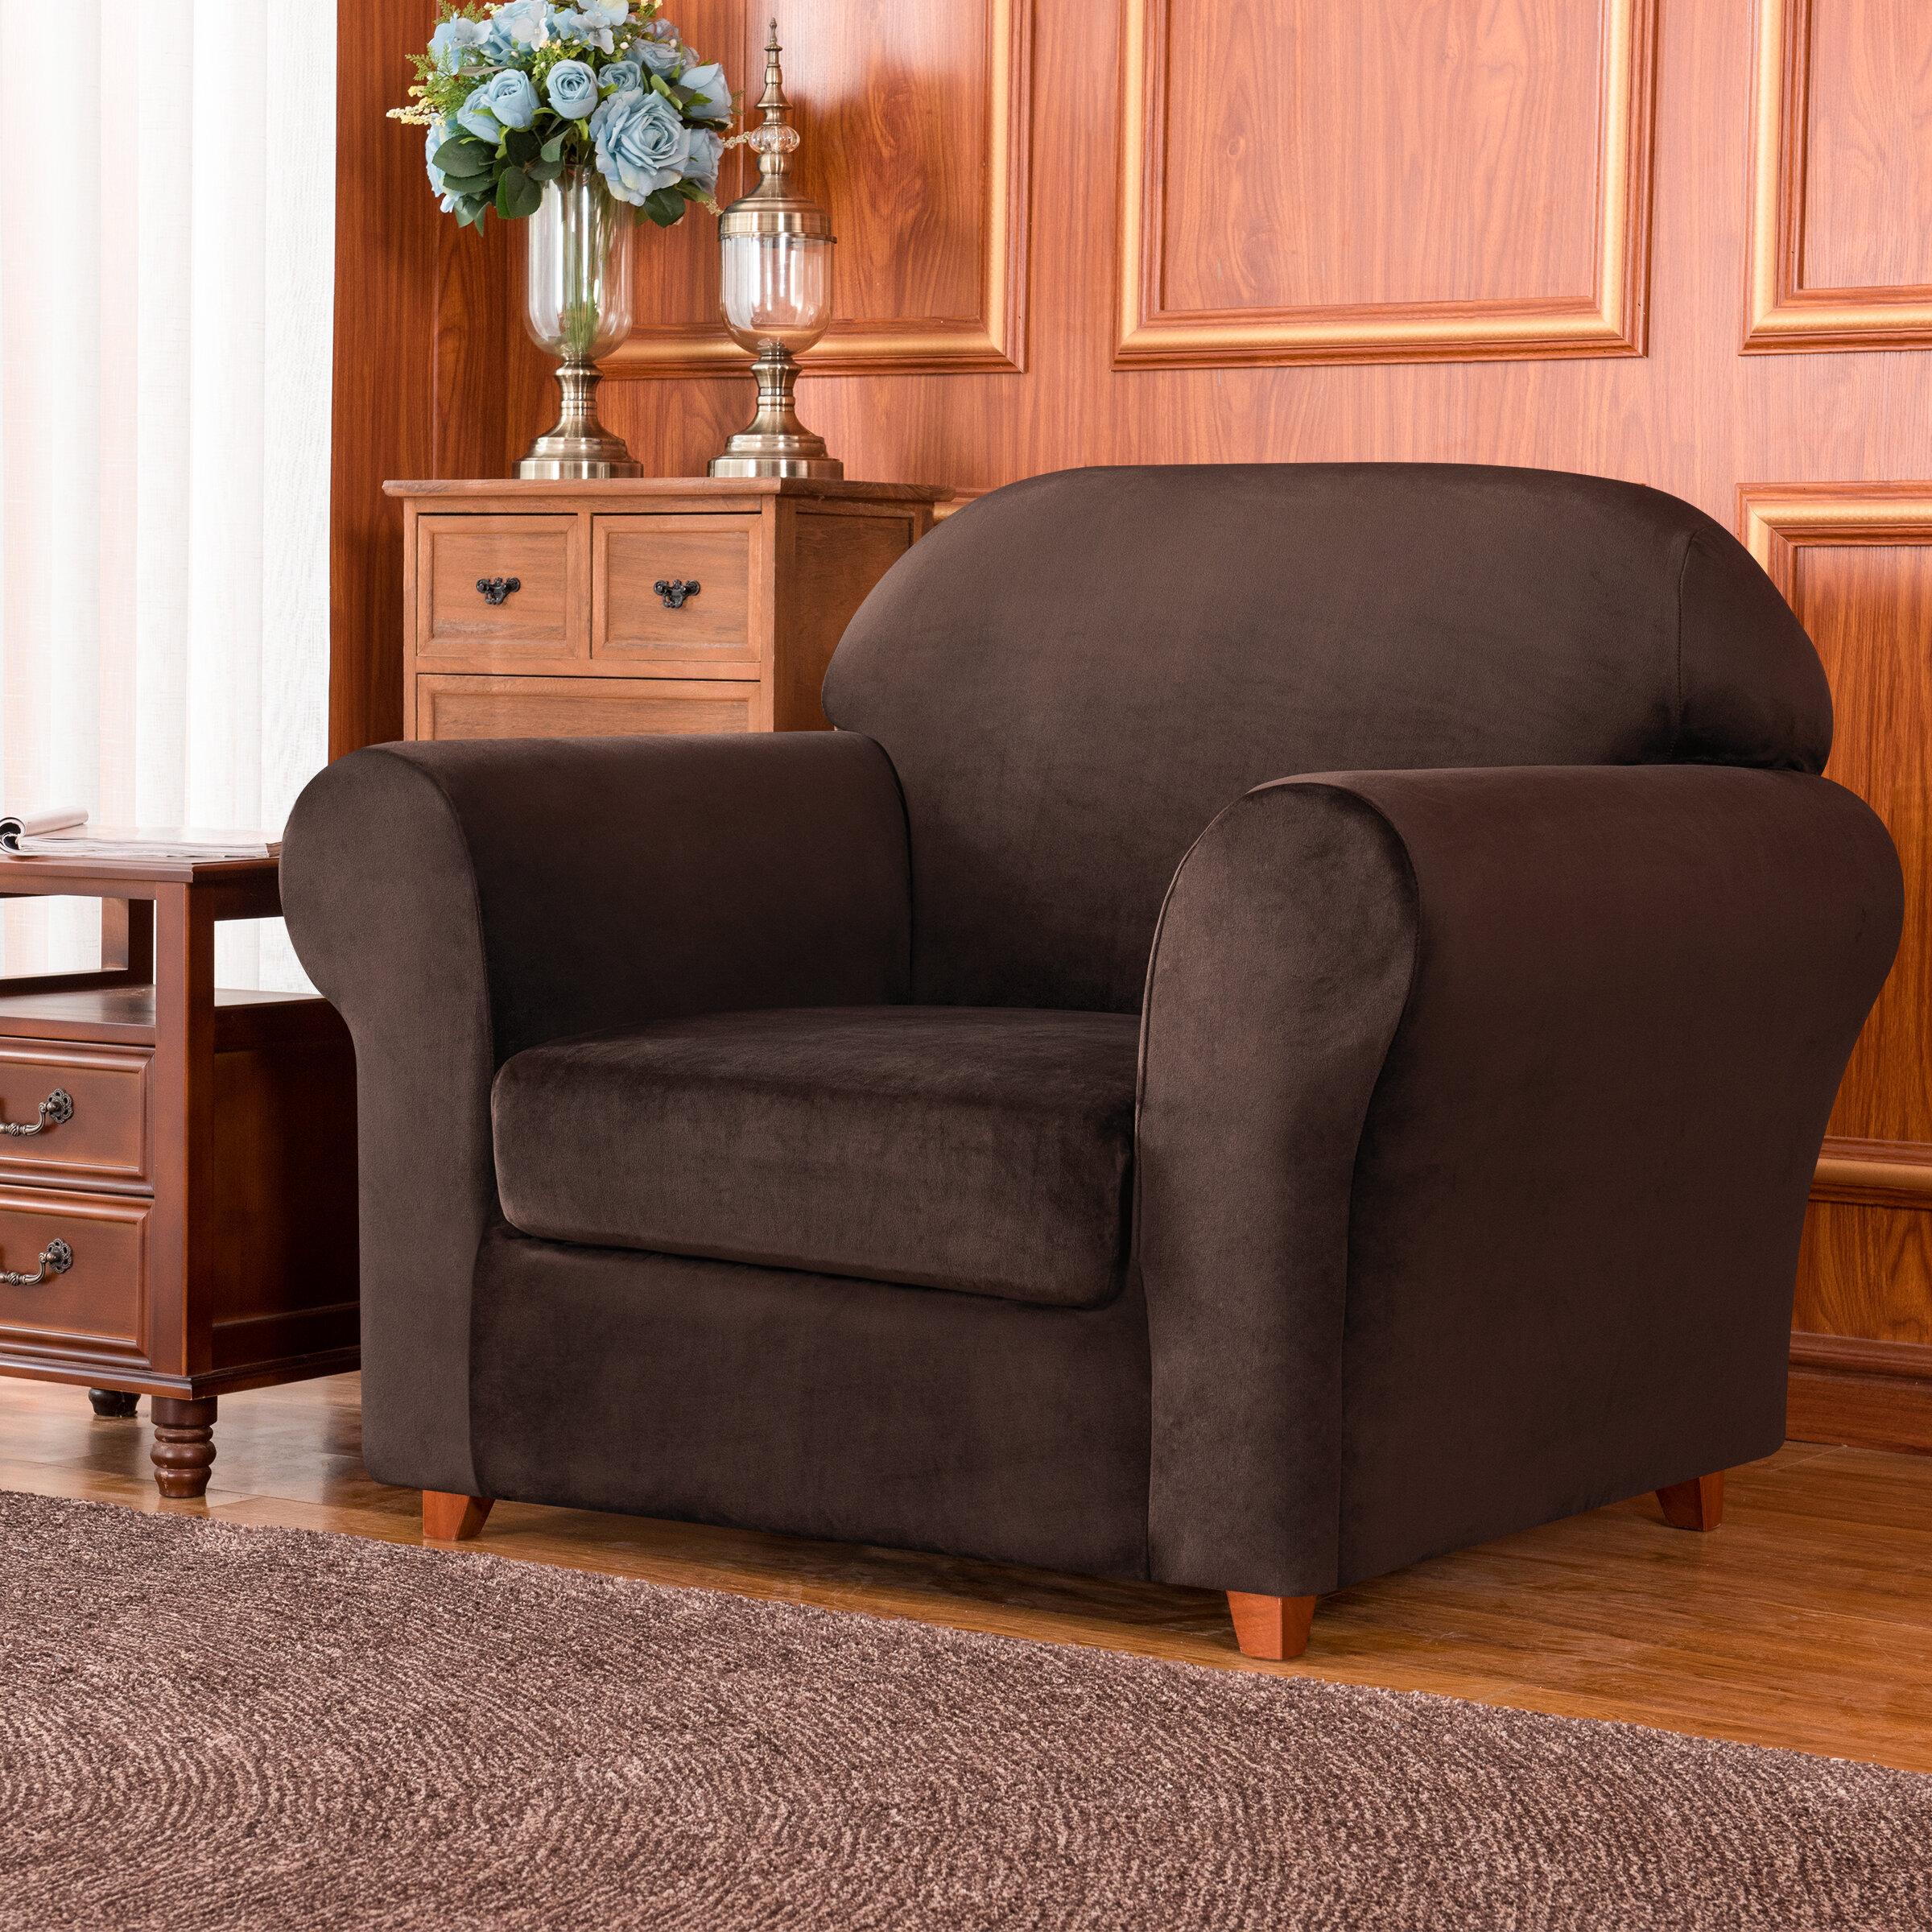 Red Barrel Studio Bronica Plush Soft Stretchy Box Cushion Armchair Slipcover Reviews Wayfair